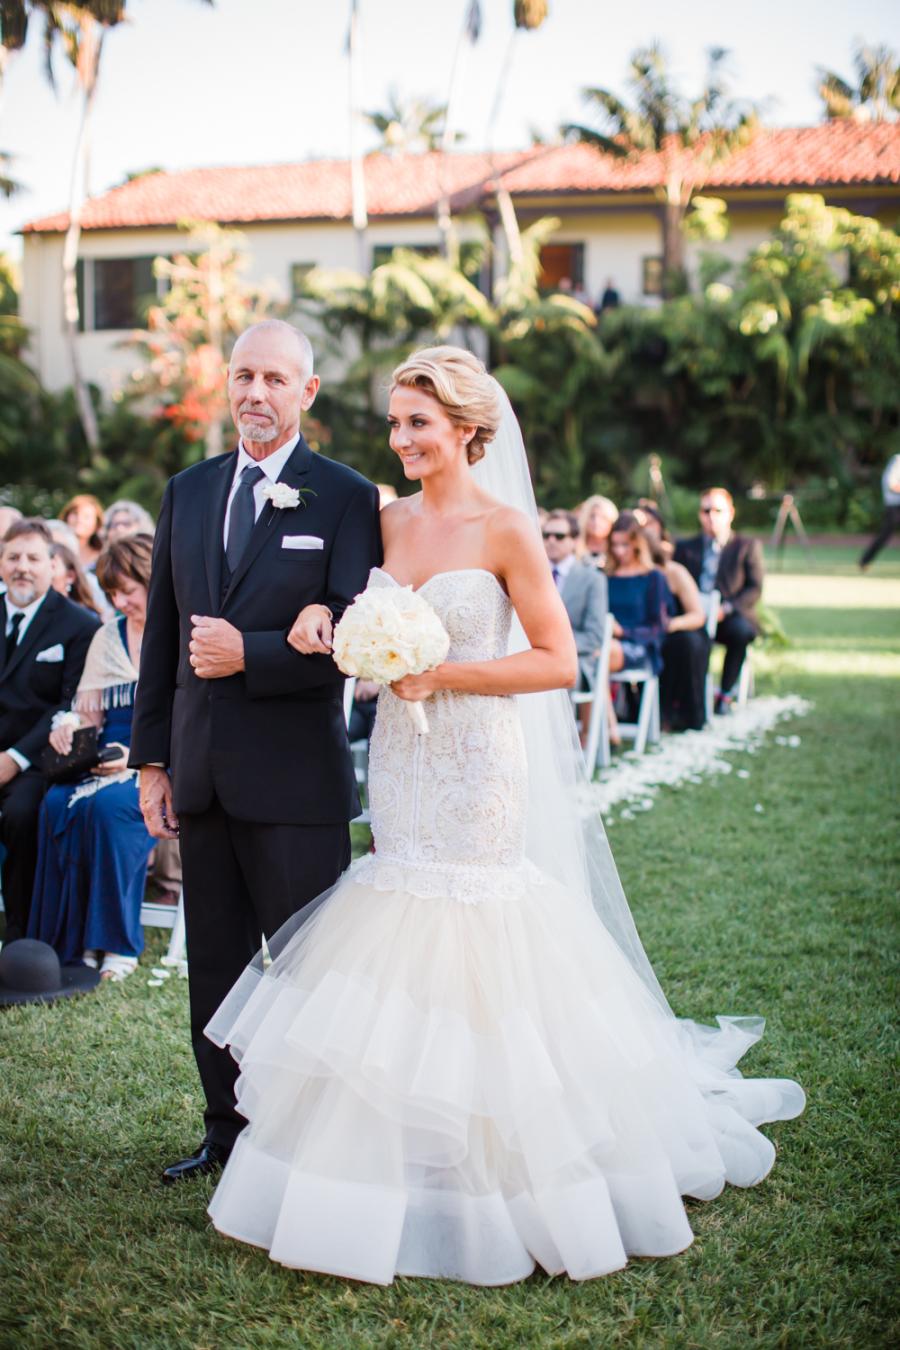 www.santabarbarawedding.com | Ann Johnson Events | Jessica Lewis | The Biltmore | Bride walking down aisle